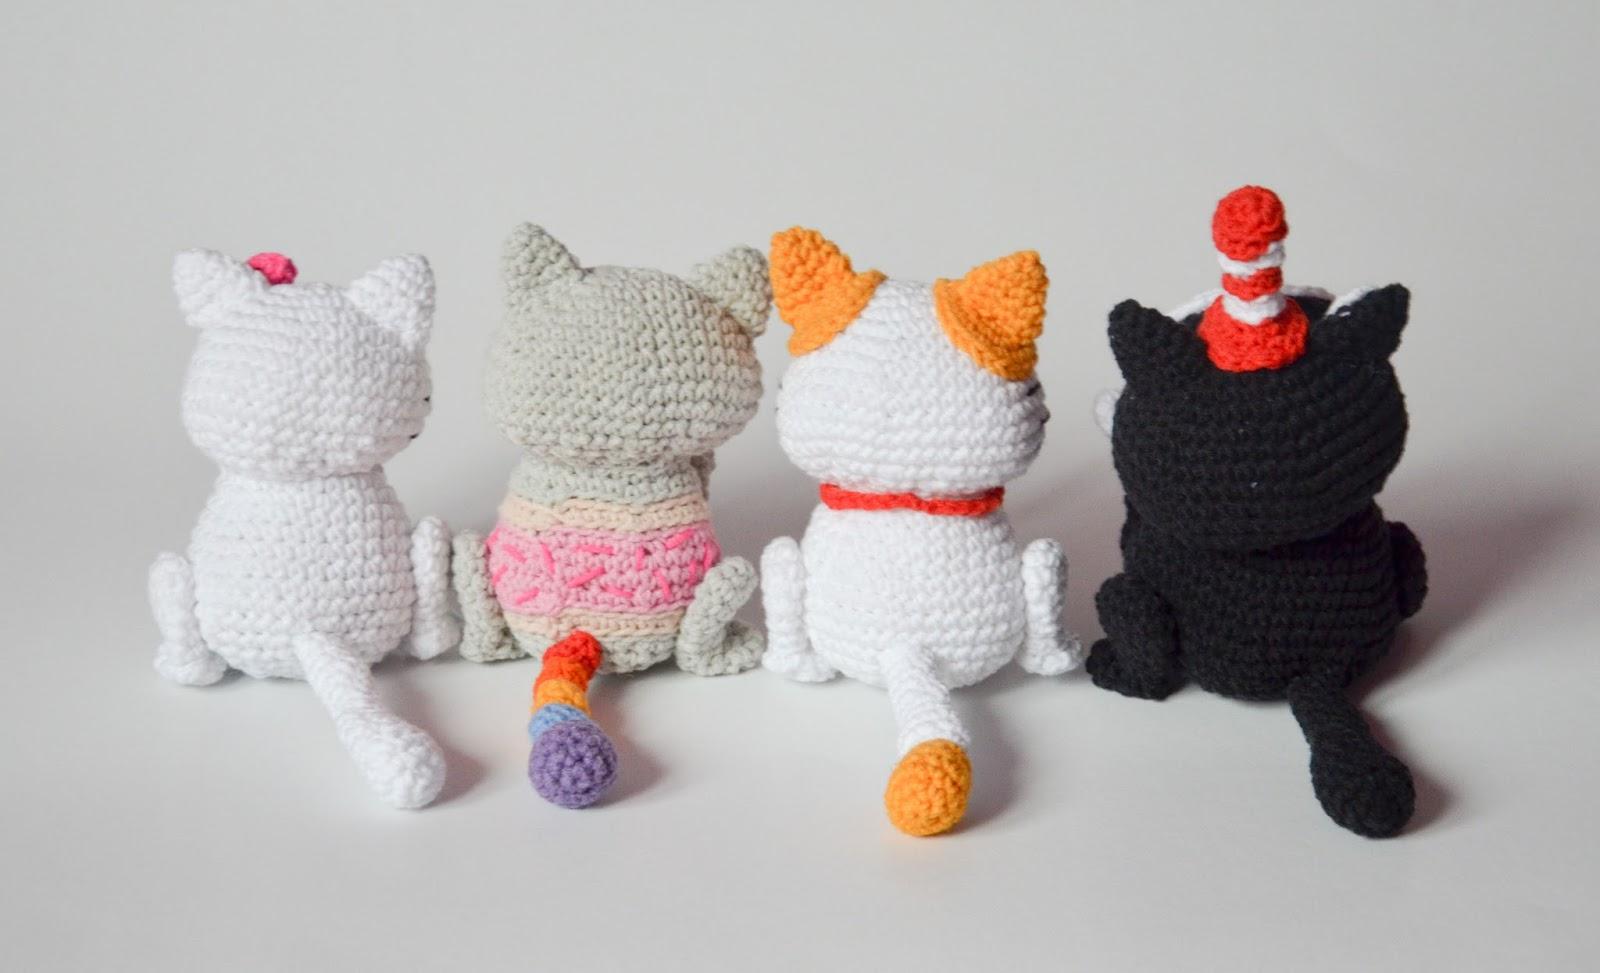 Krawka: Lucky cats